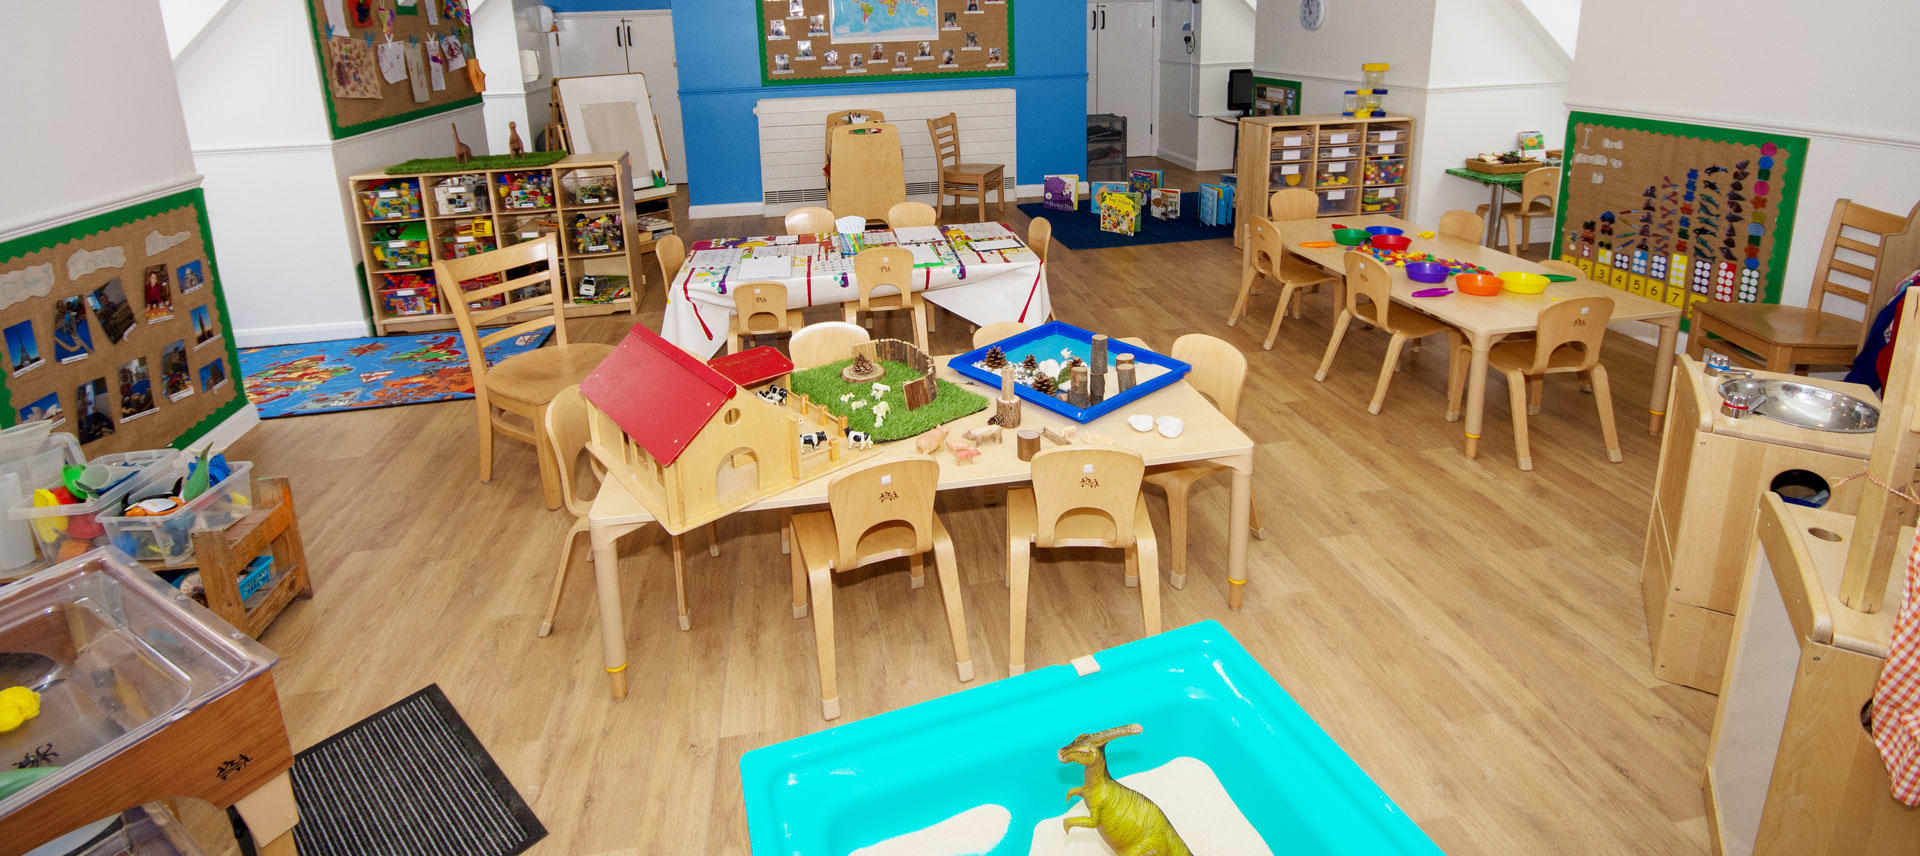 Bright Horizons Wolfson Court Day Nursery and Preschool